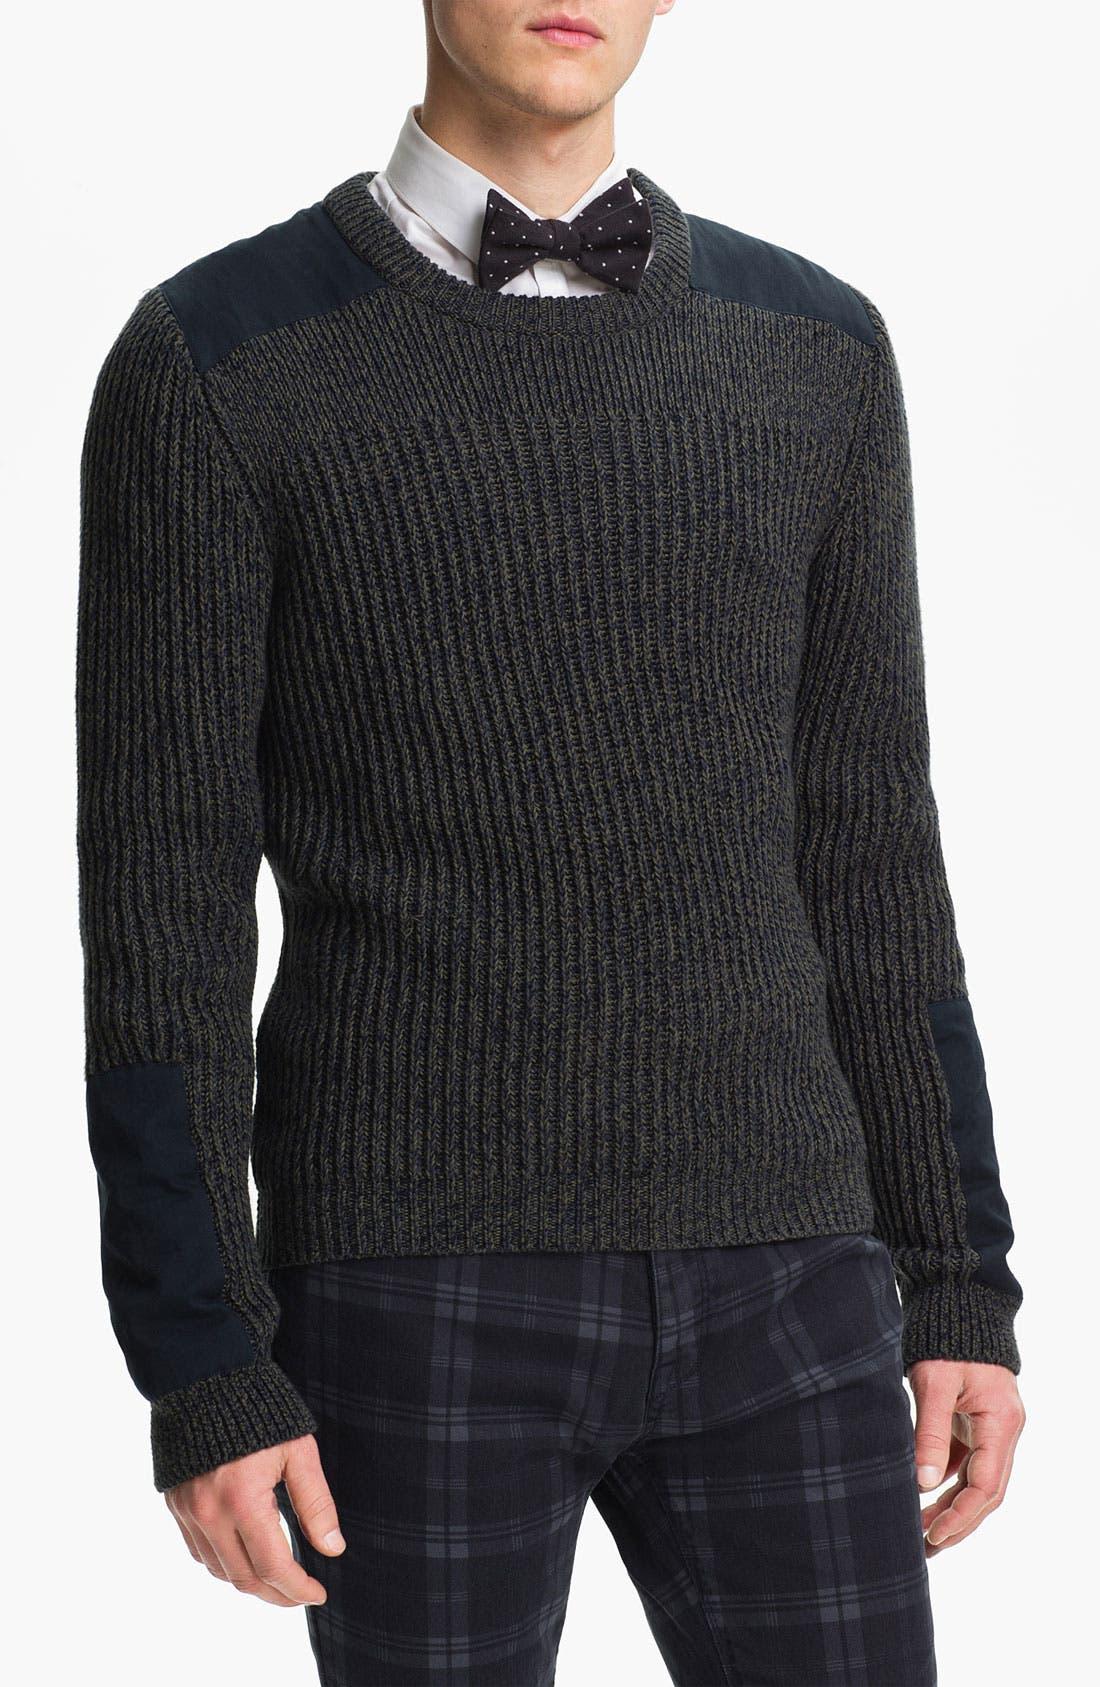 Alternate Image 1 Selected - Topman Military Crewneck Sweater